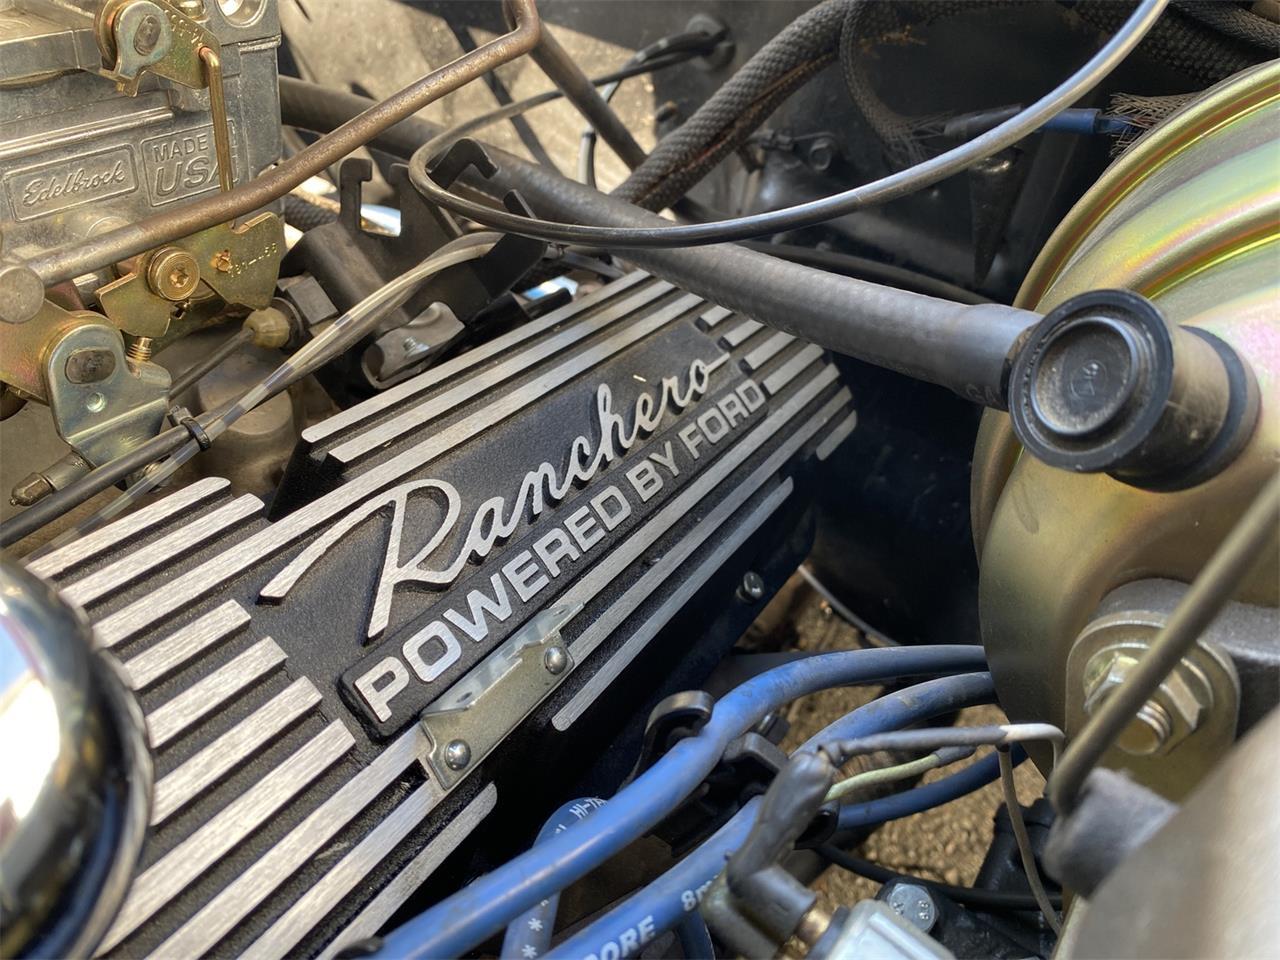 1957 Ford Ranchero (CC-1420772) for sale in Fairfield, California